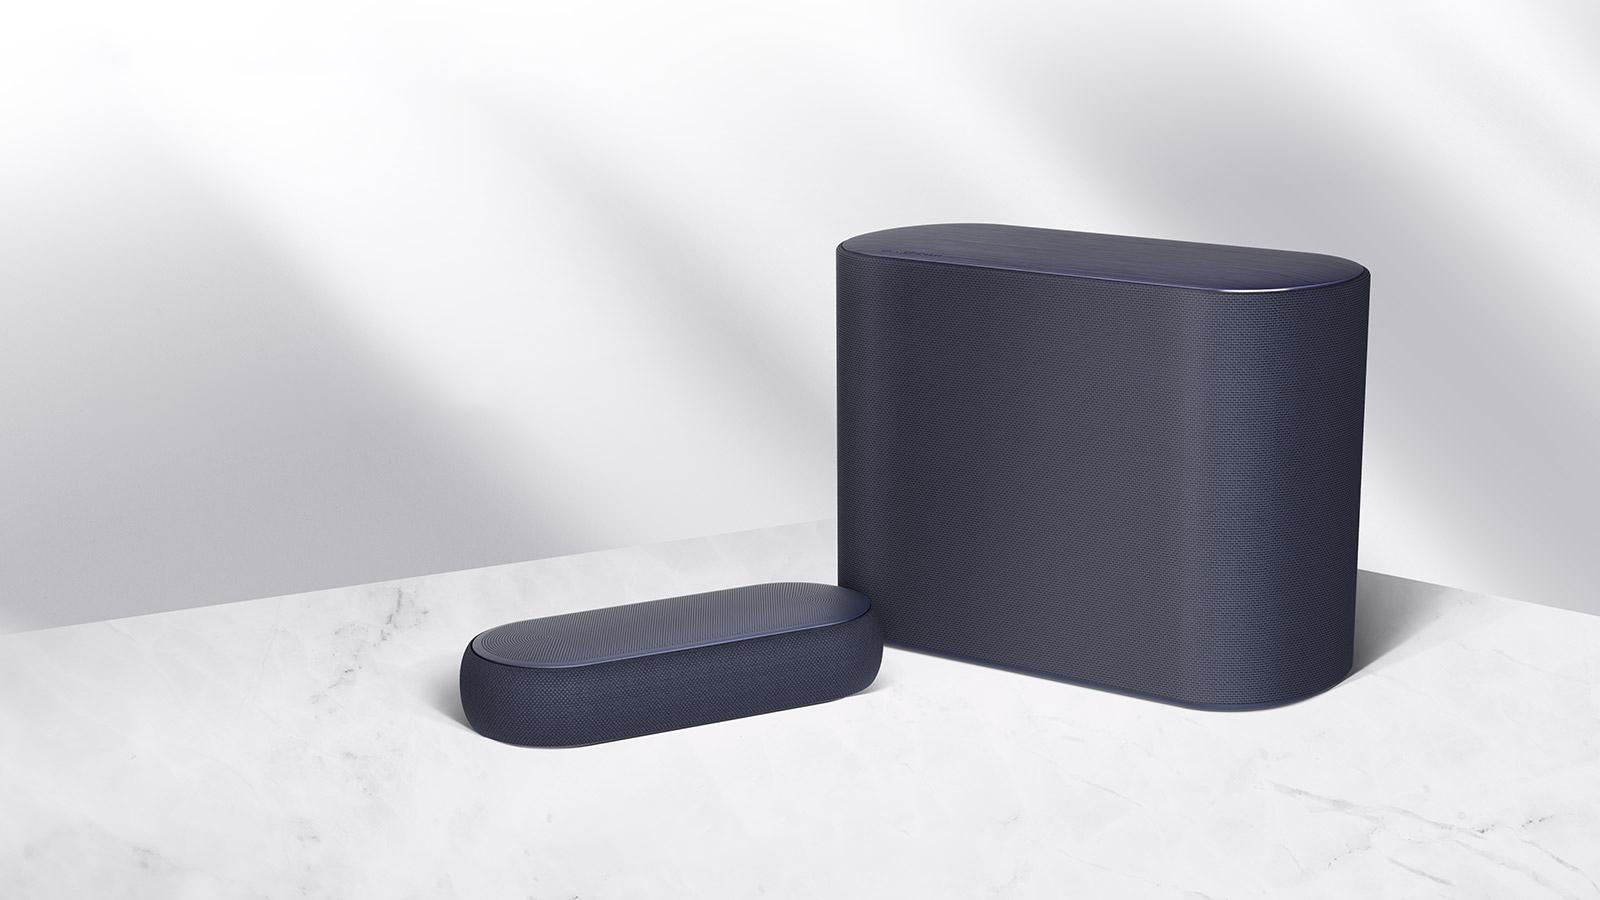 LG QP5 Éclair soundbar packs Dolby Atmos, DTS:X, and upfiring drivers in a tiny package